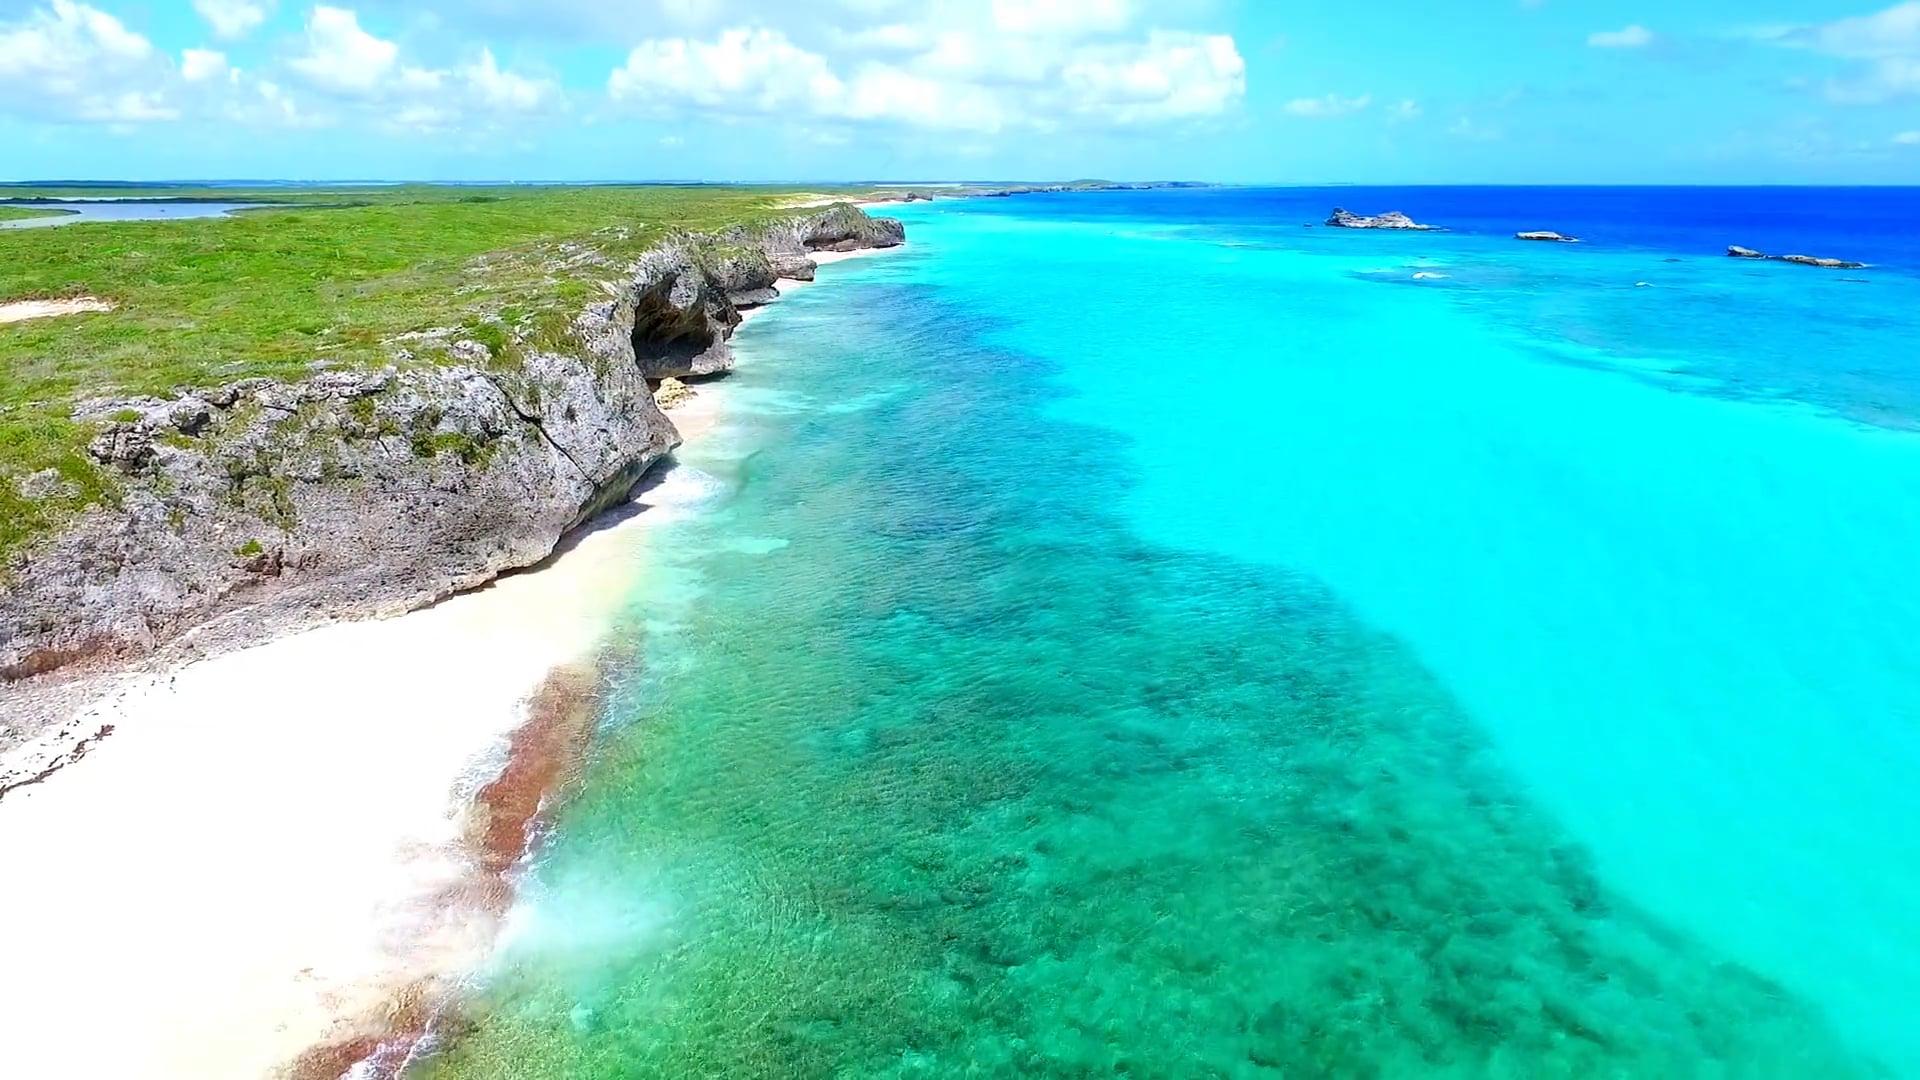 Our Turks & Caicos Islands by Caya Hico Media